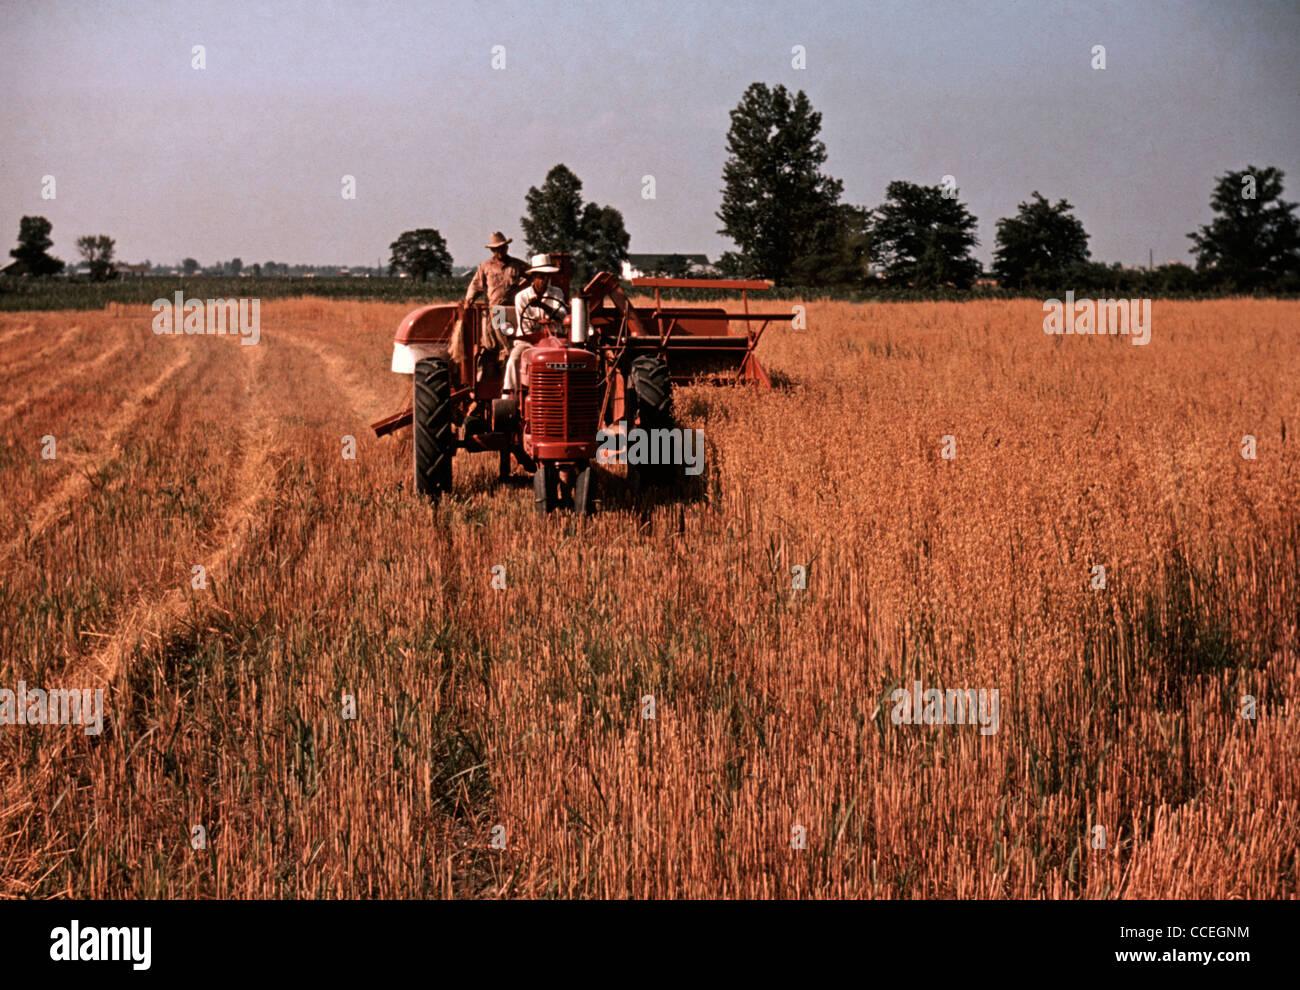 Harvesting oats, southeastern Georgia, circa 1940 - Stock Image